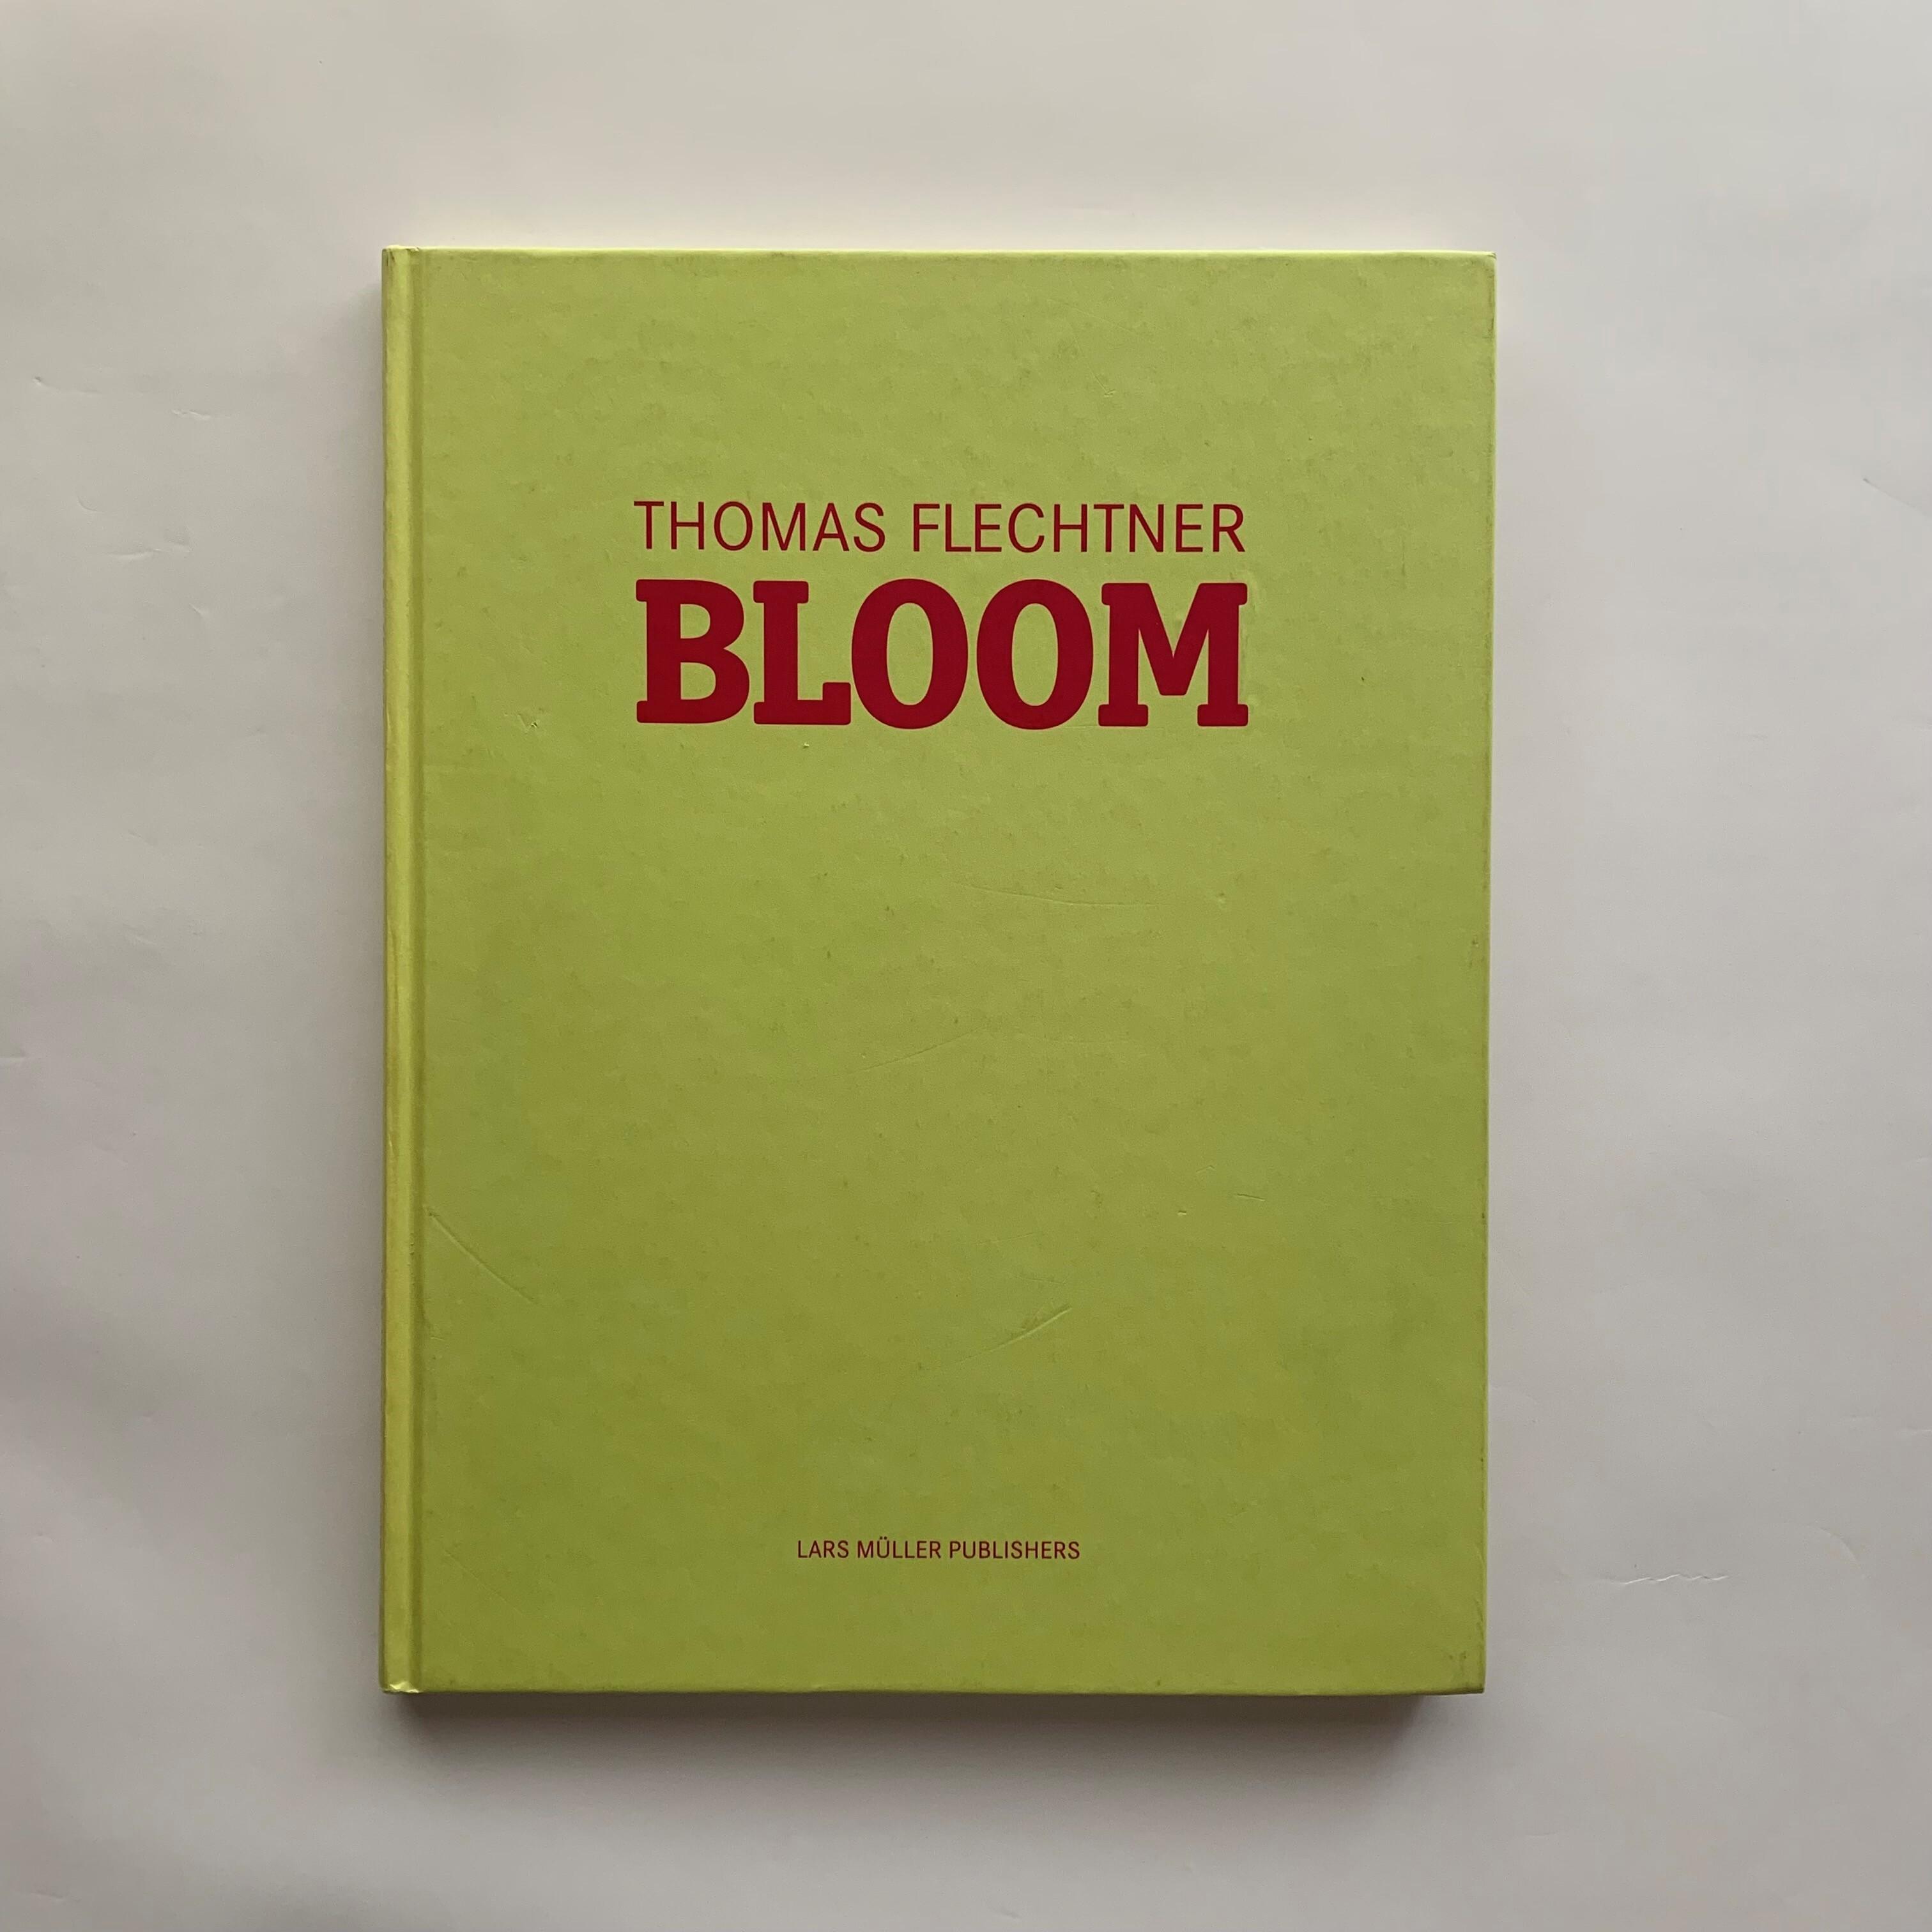 Bloom / Thomas Flechtner